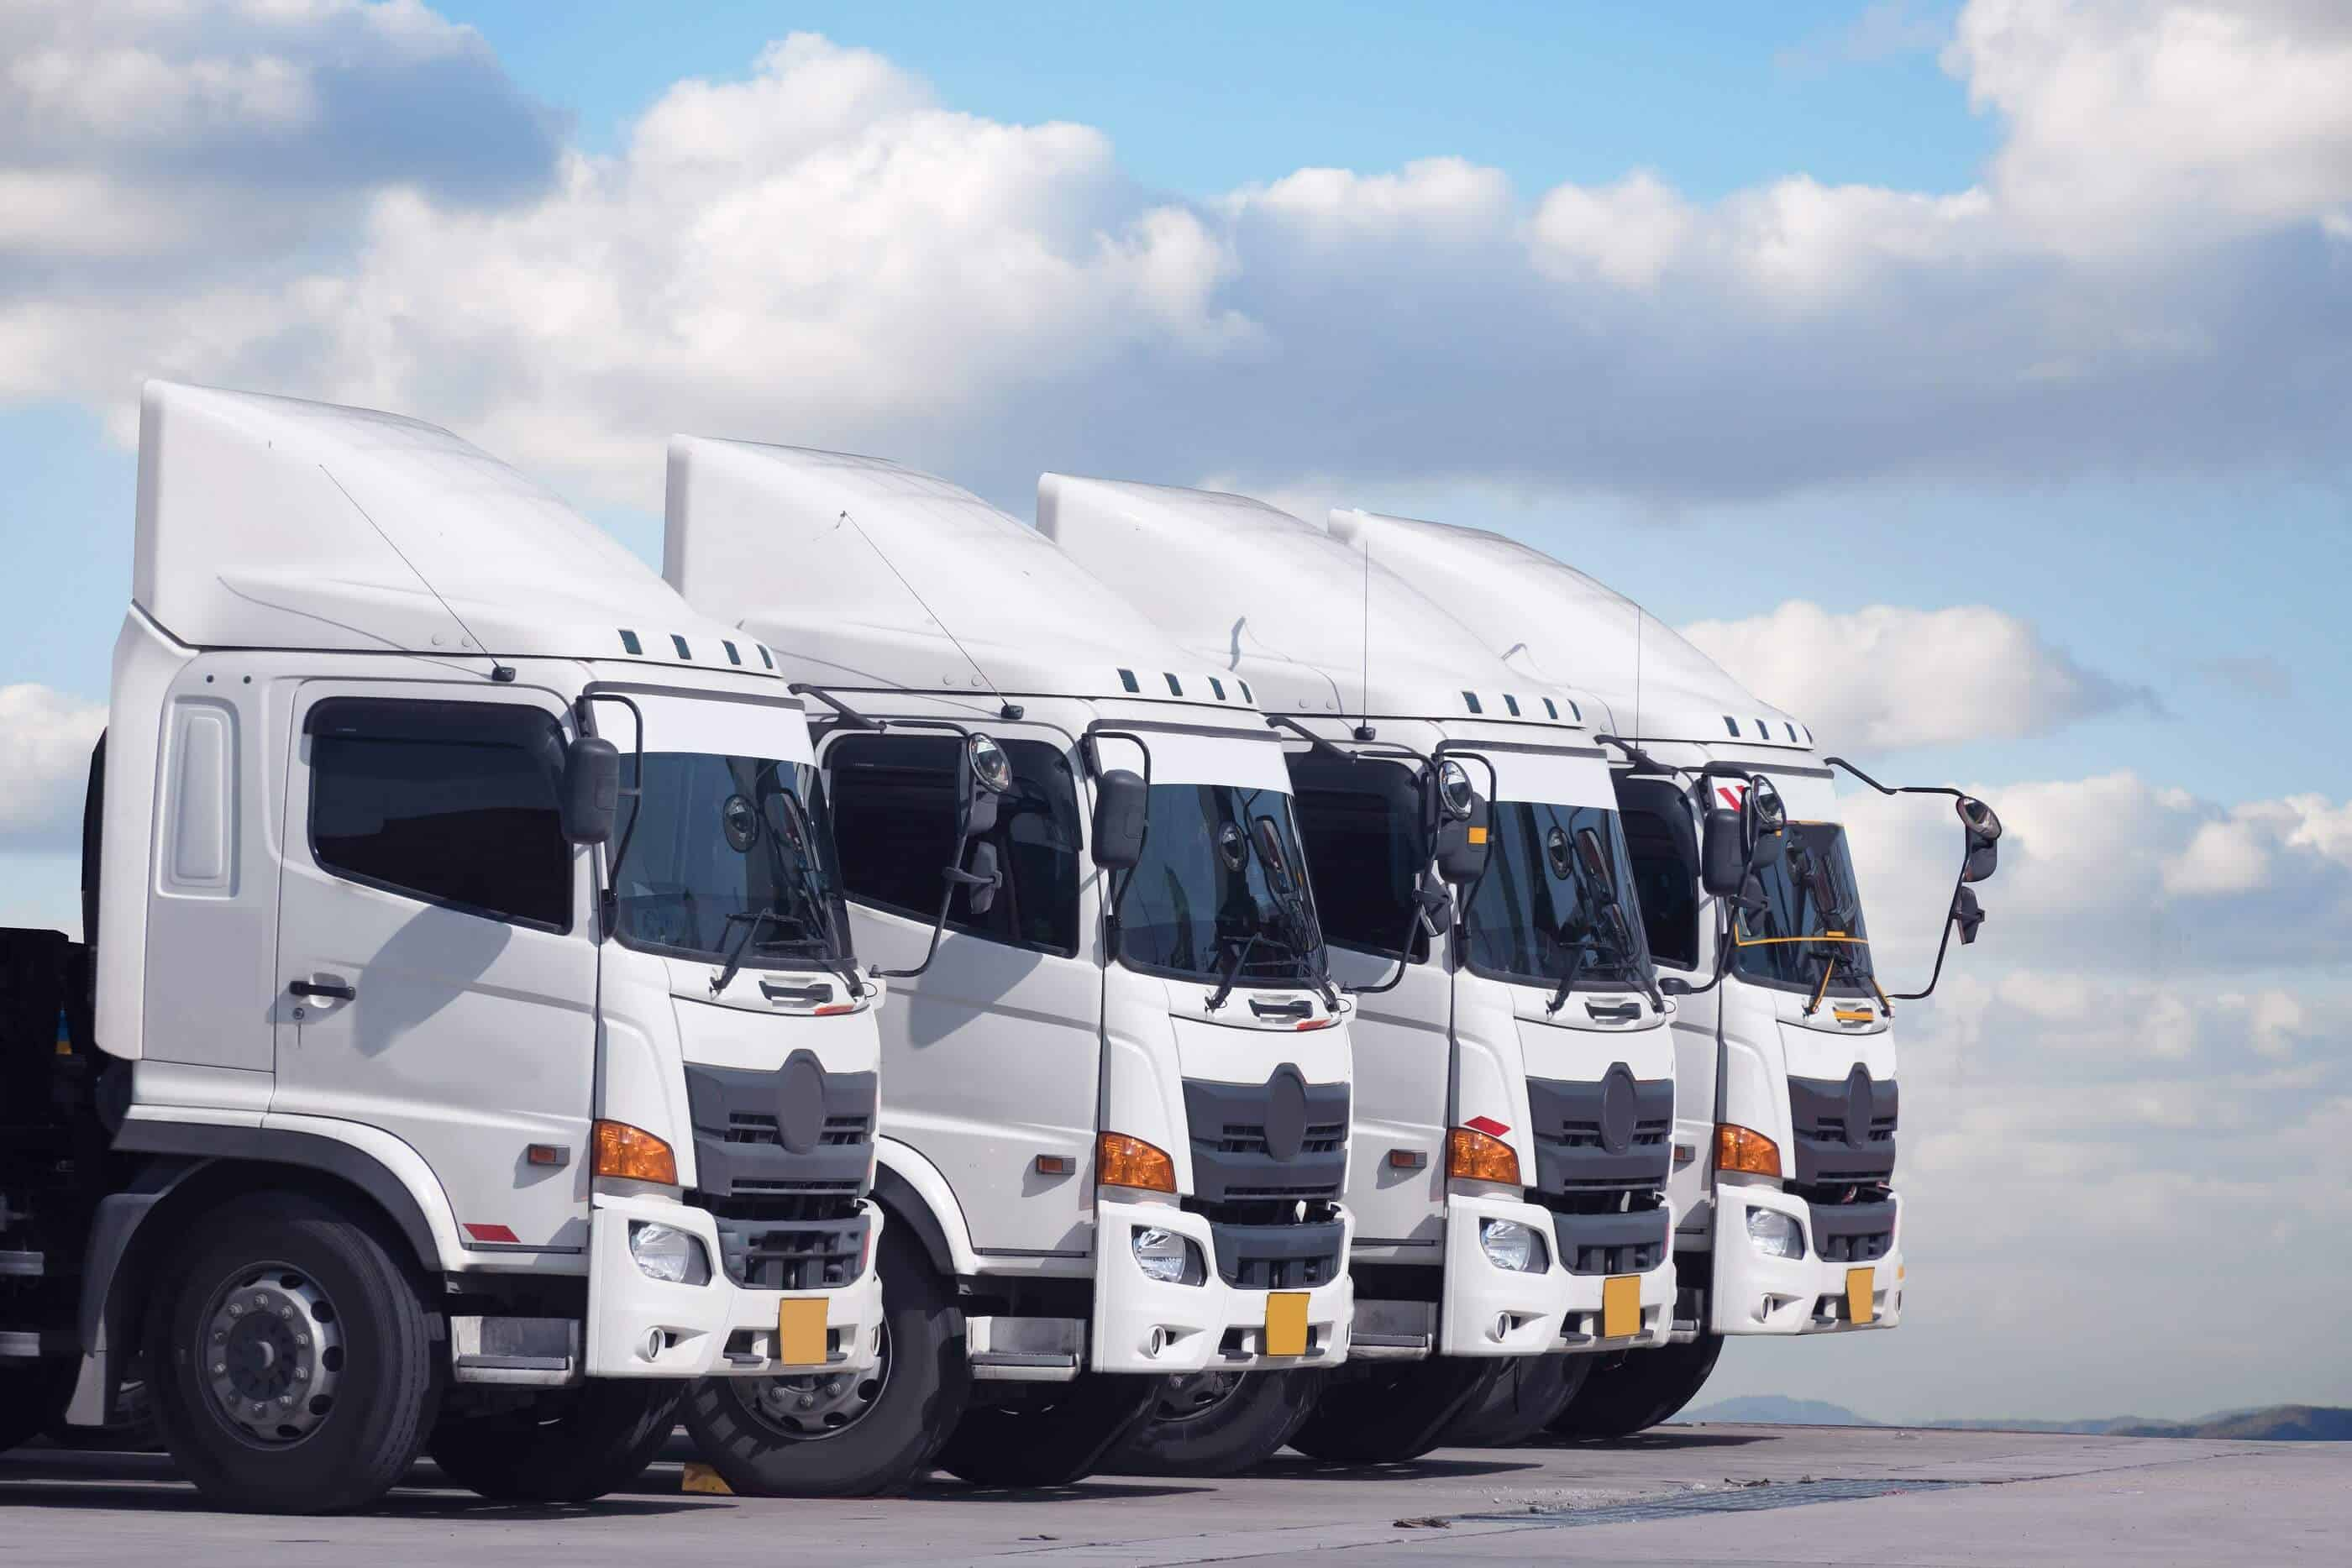 Line of large trucks